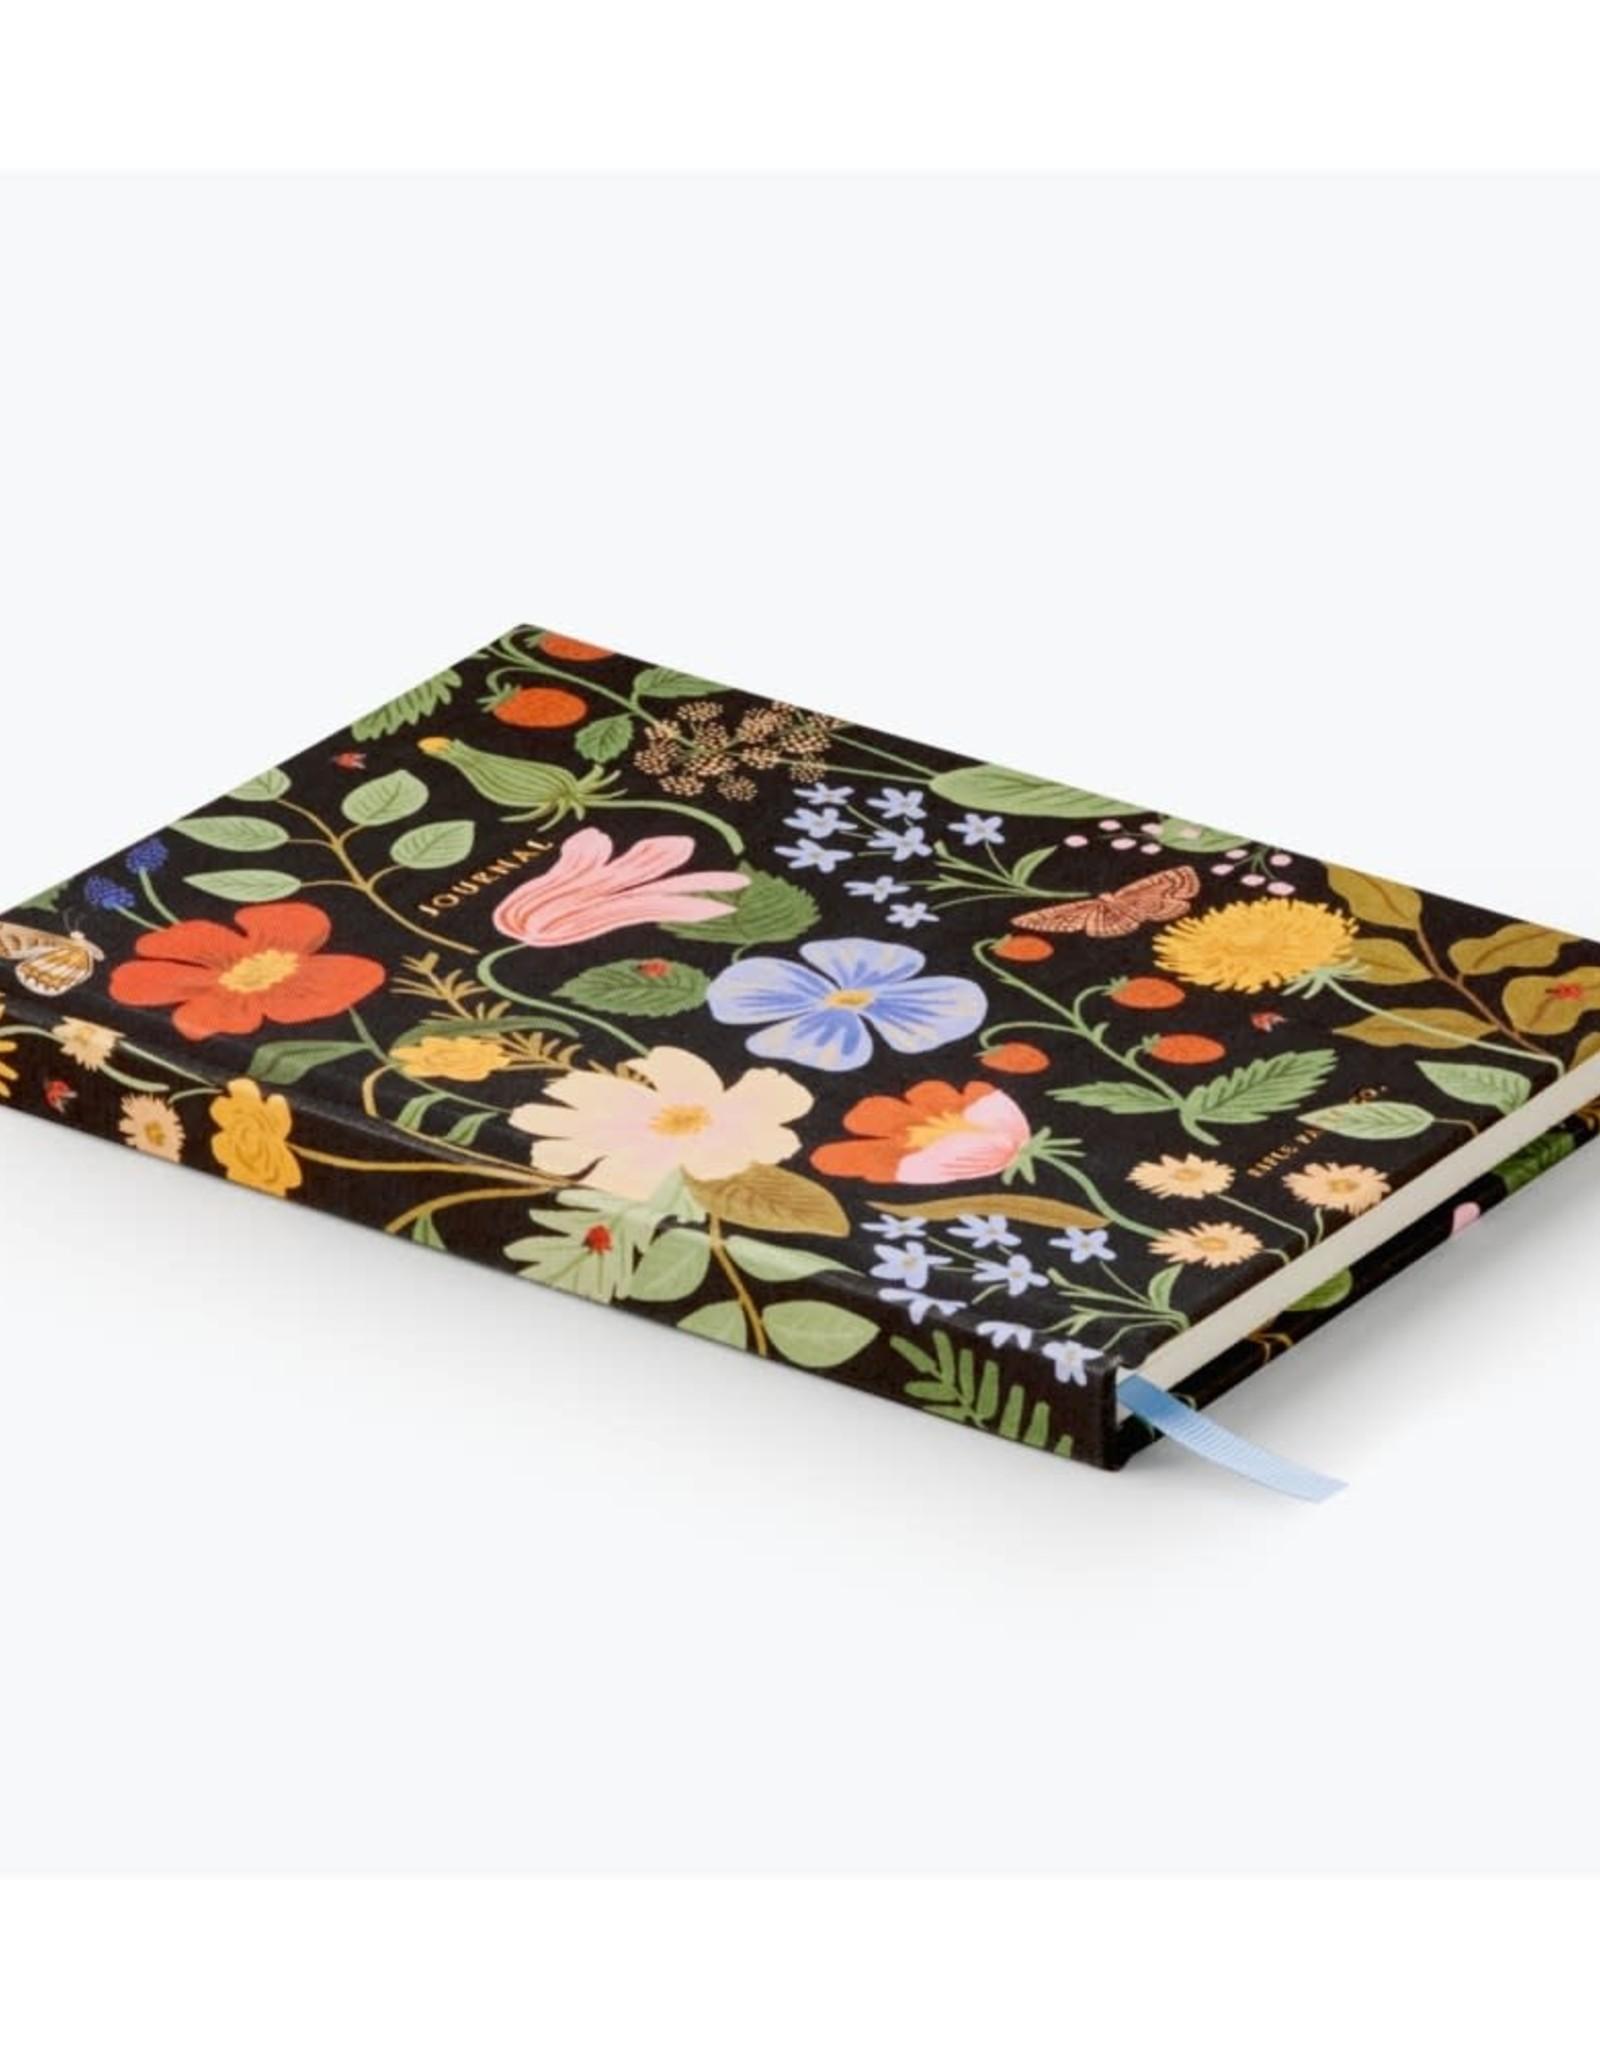 Rifle paper co. Journal en tissus - Strawberry Fields